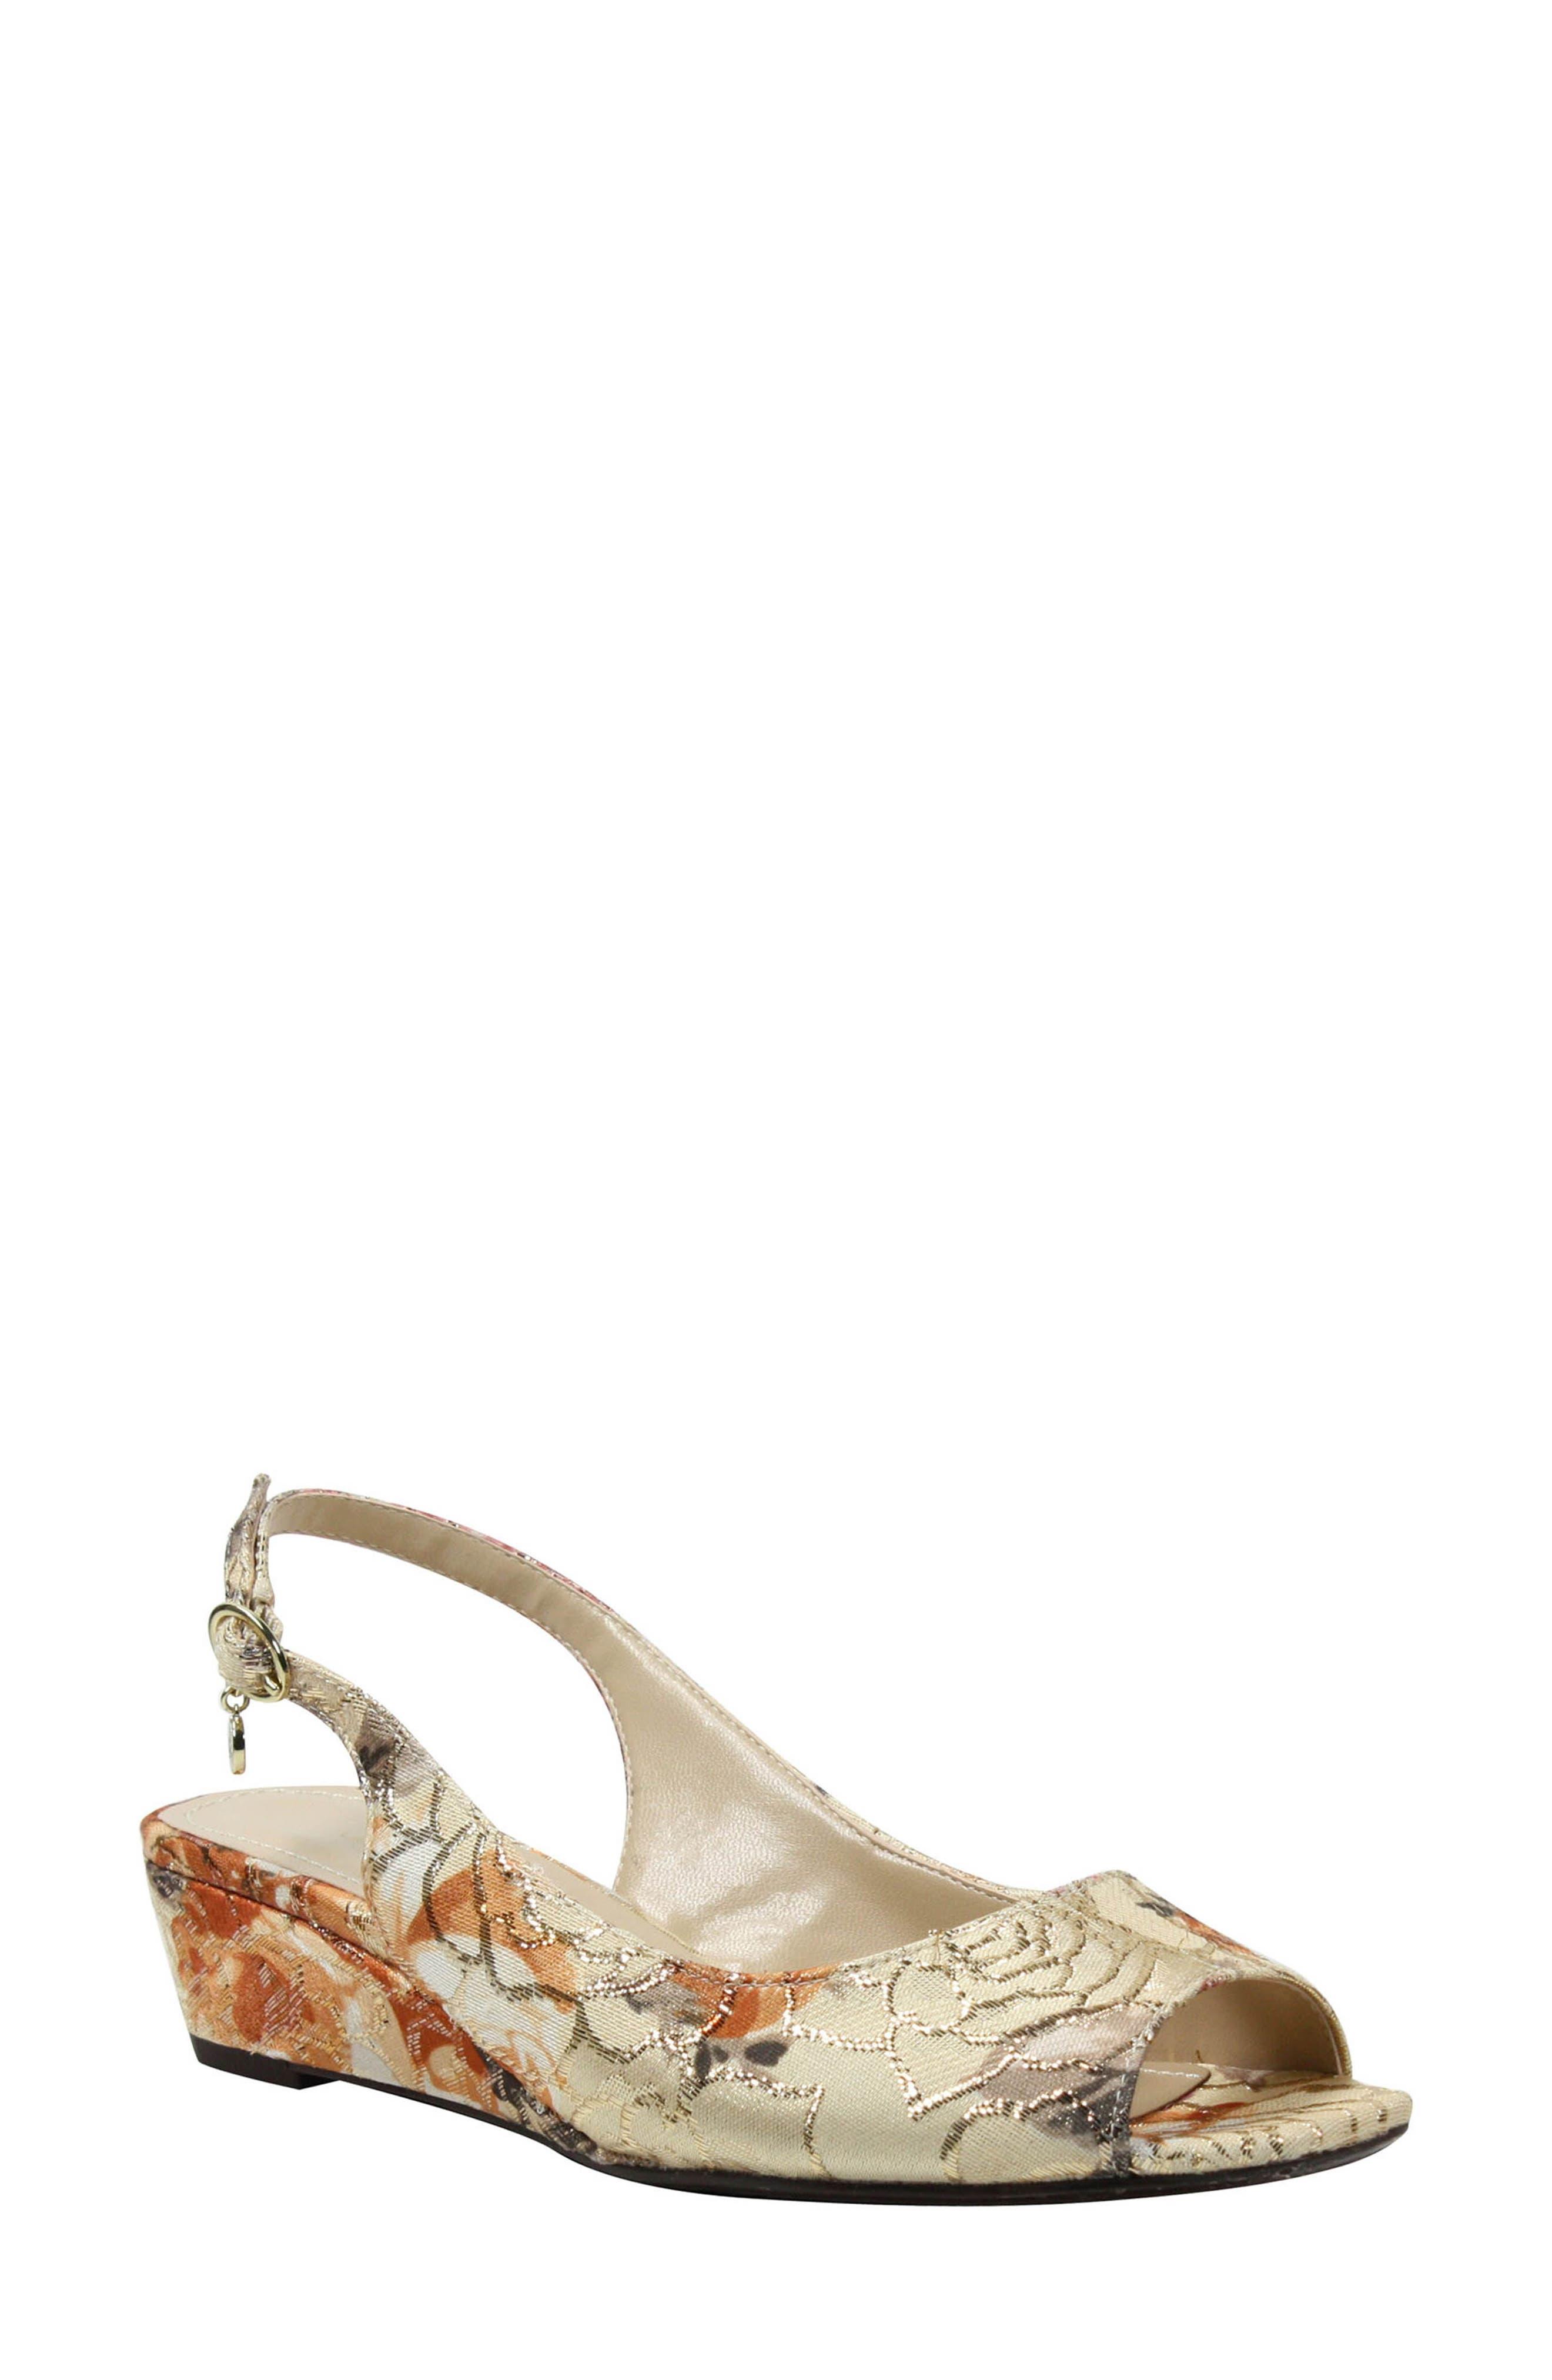 Alivia Slingback Sandal,                         Main,                         color, Nude Multi/ Gold Fabric